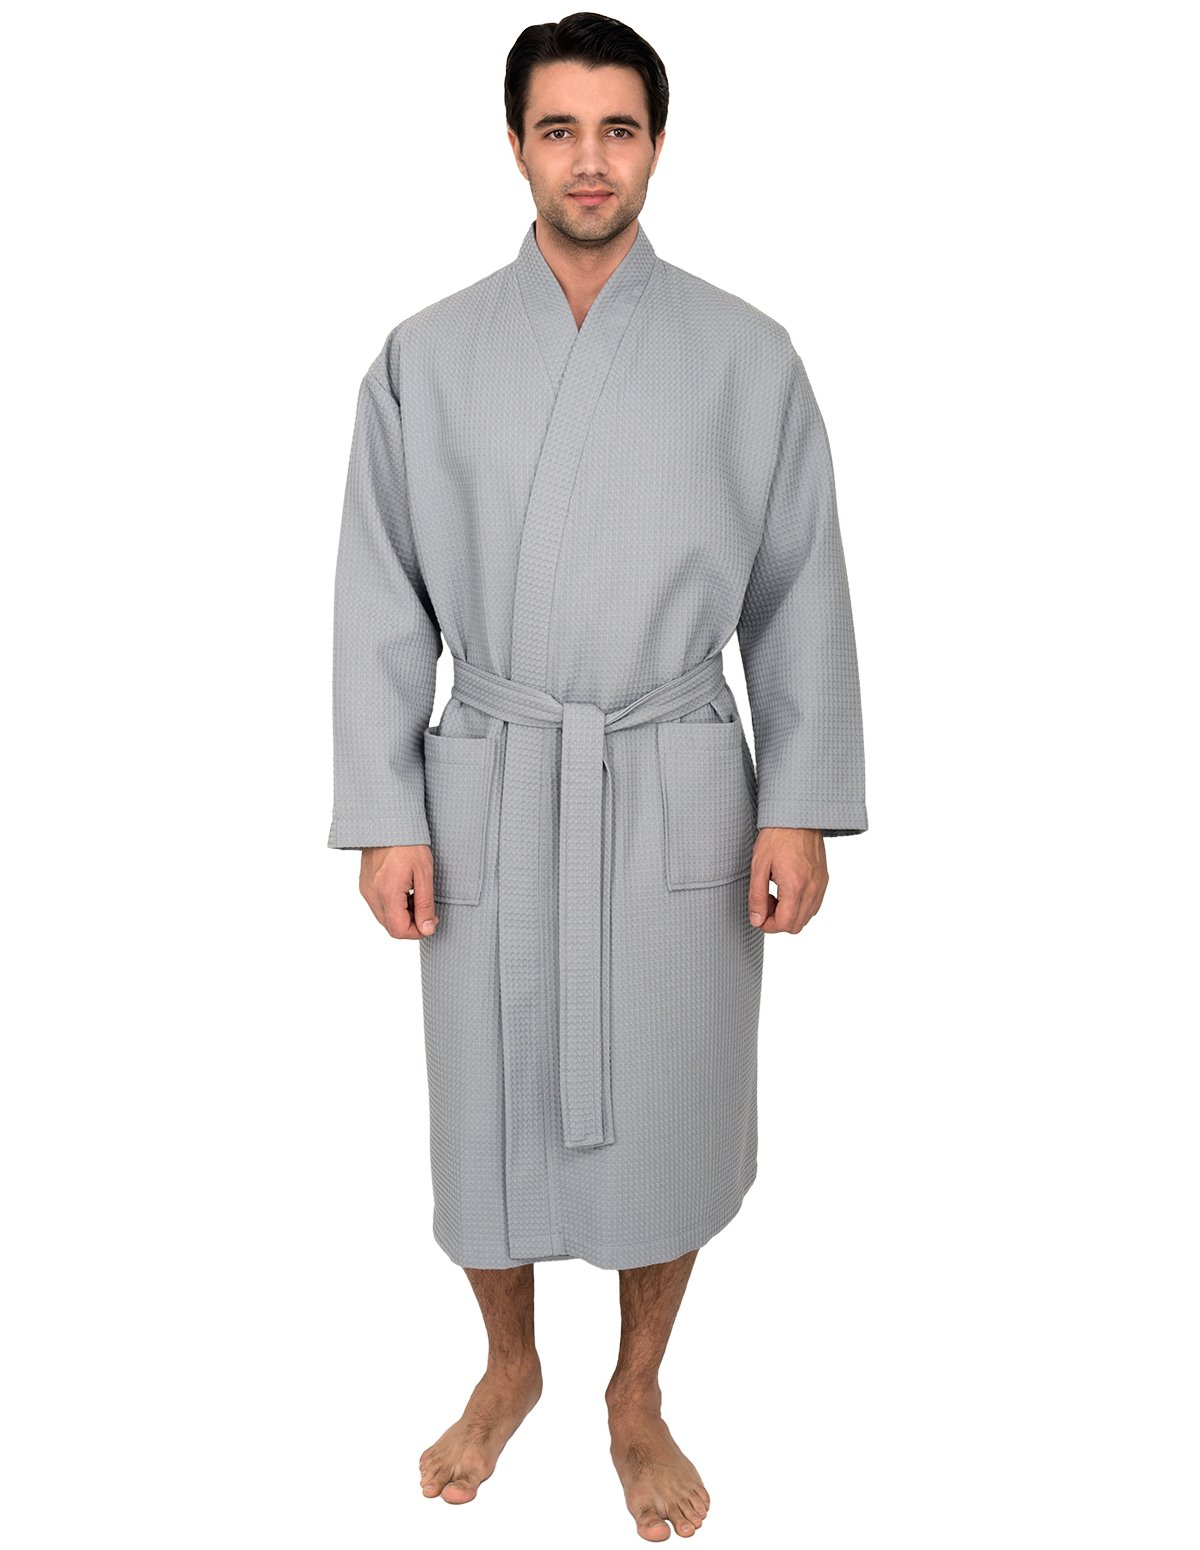 TowelSelections Men's Waffle Bathrobe Turkish Cotton Kimono Robe Large/X-Large Quarry